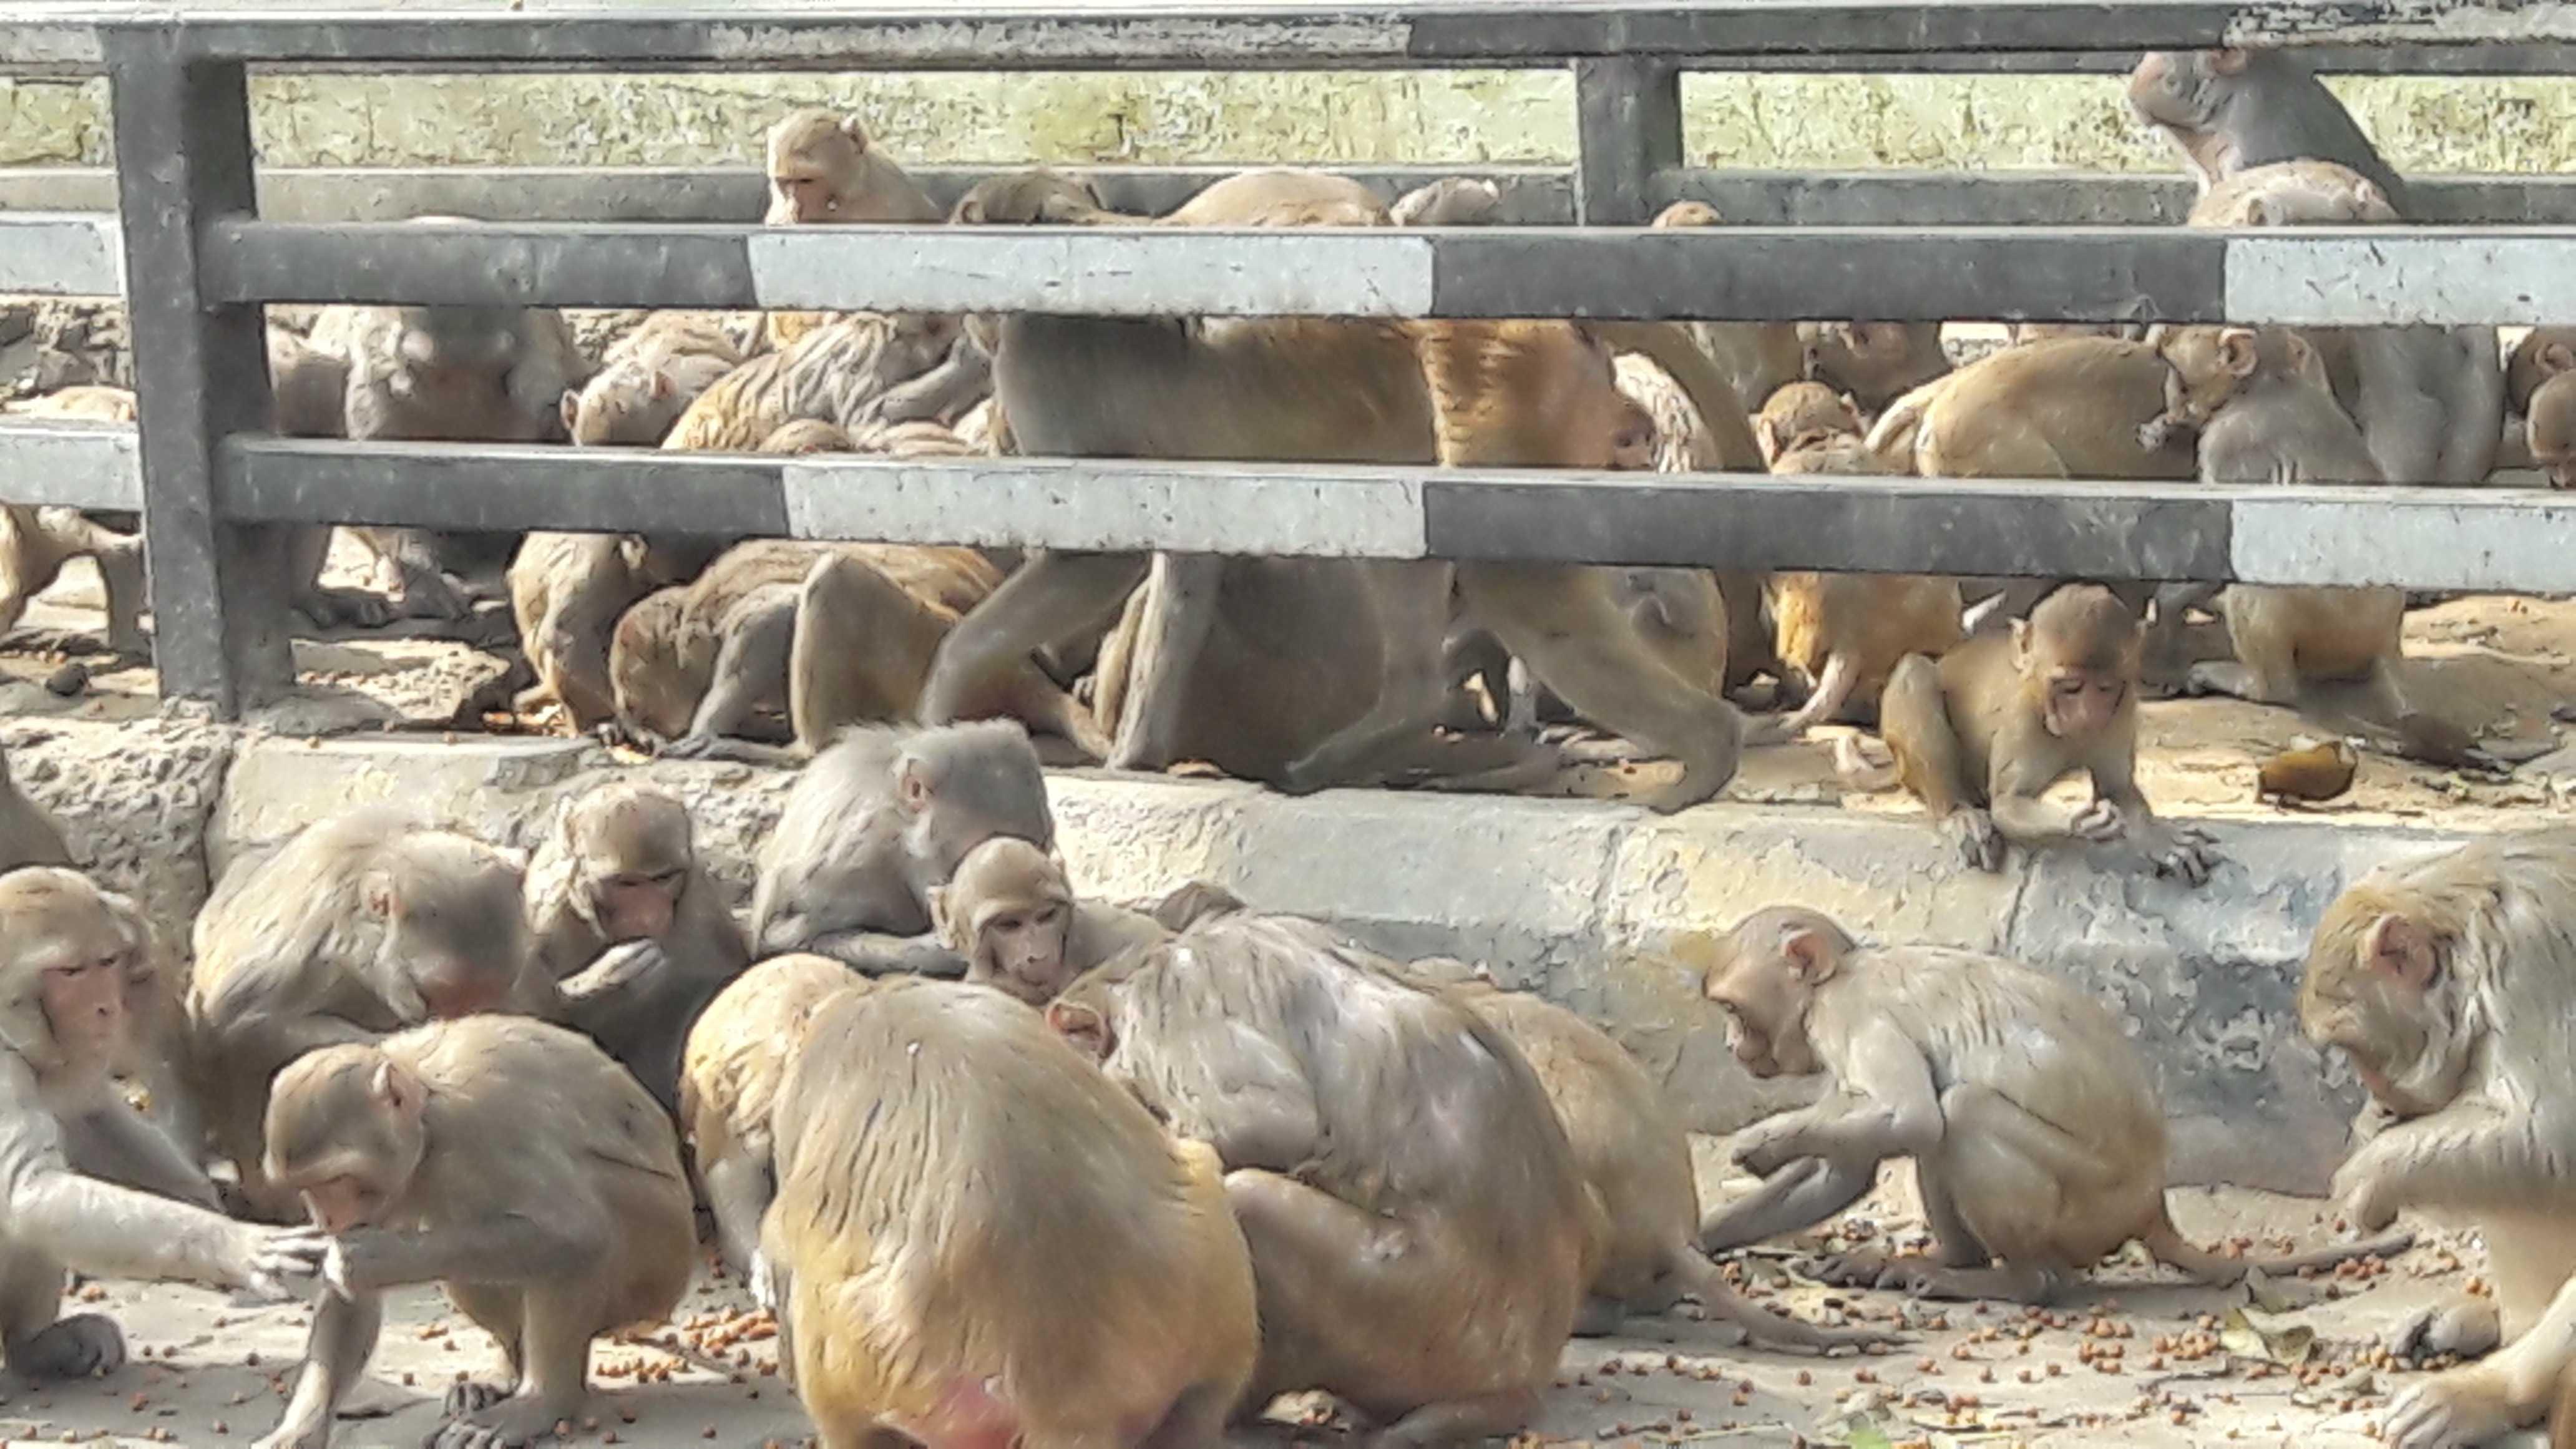 Monkeys call the shots in Vrindavan-Mathura-fnbworld